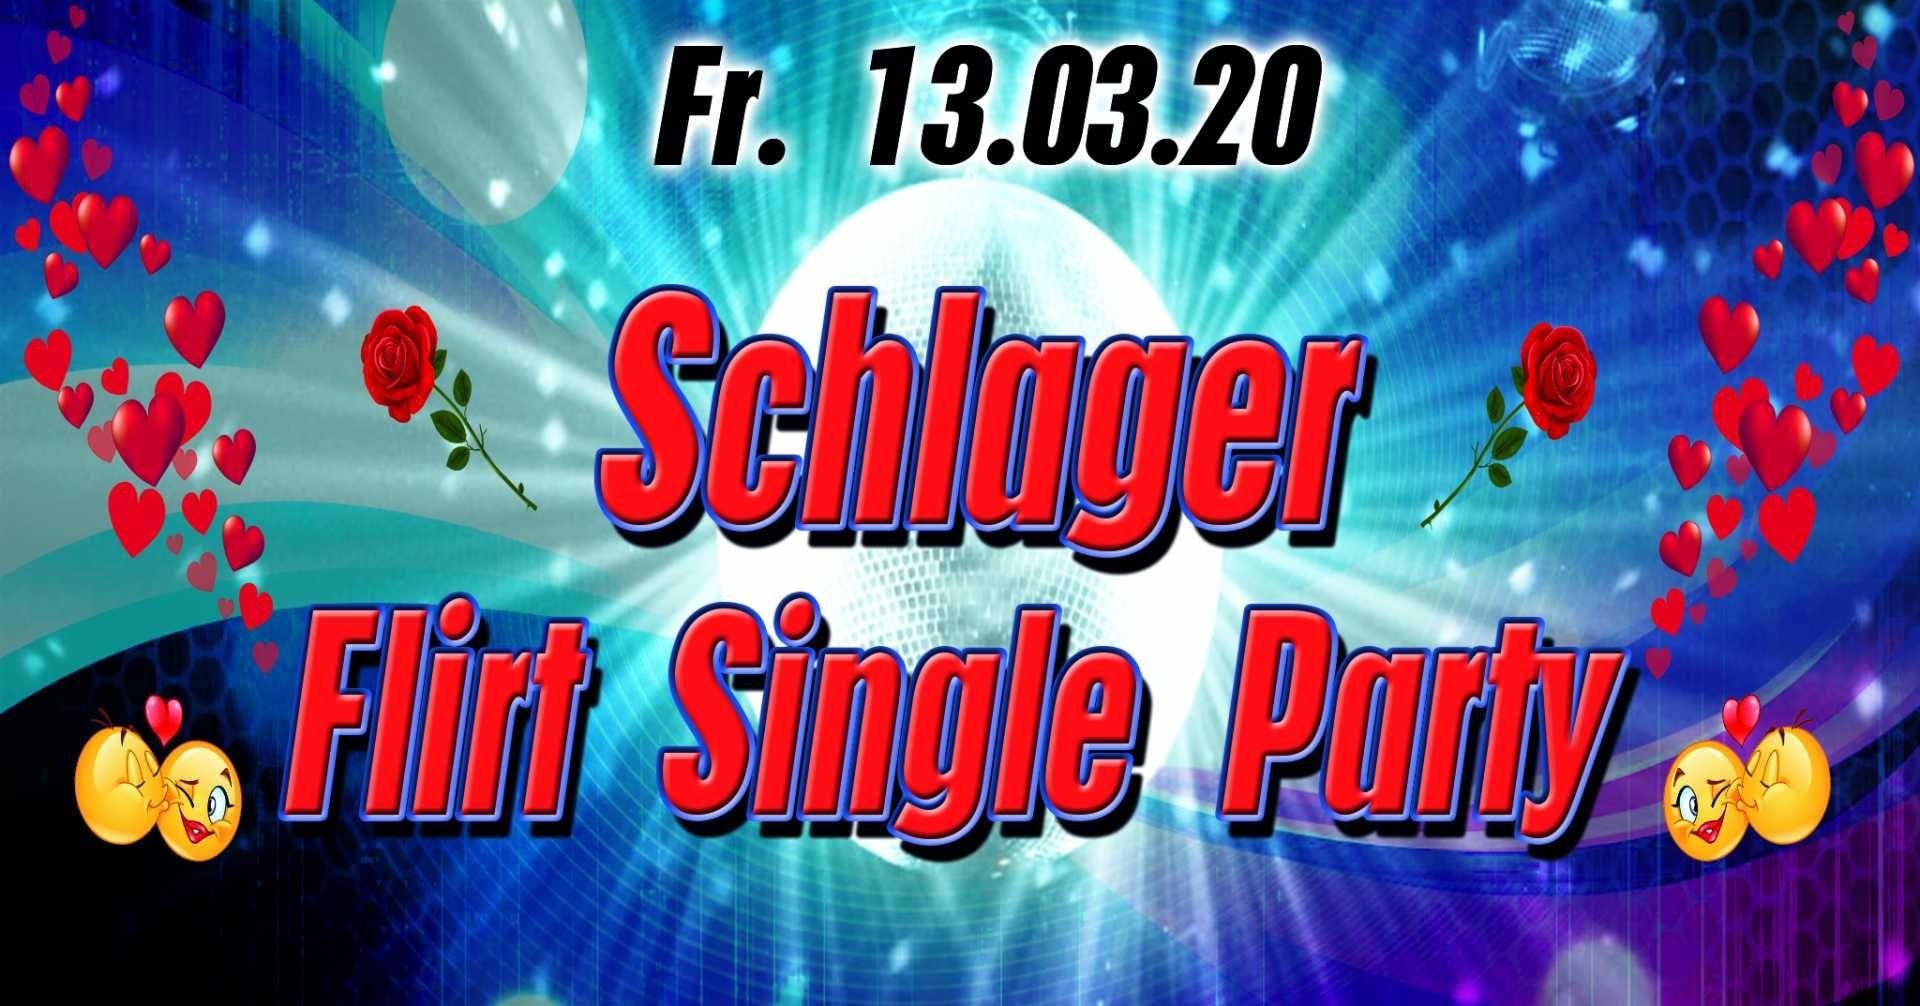 Single party schleswig holstein